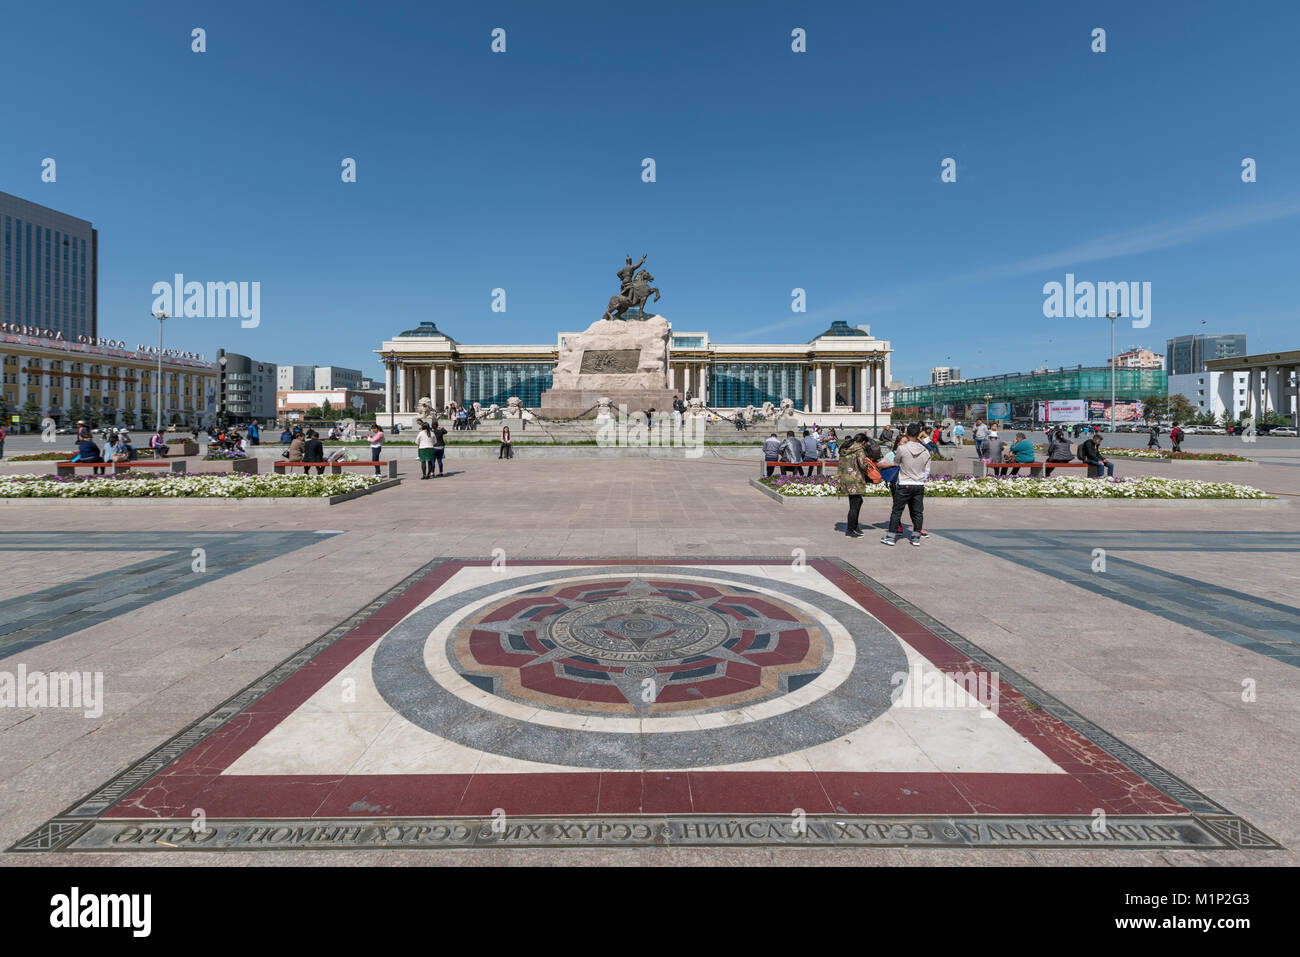 Les touristes à Sukhbaatar Square avec Damdin Sukhbaatar statue, Oulan Bator, Mongolie, Asie centrale, Asie Photo Stock